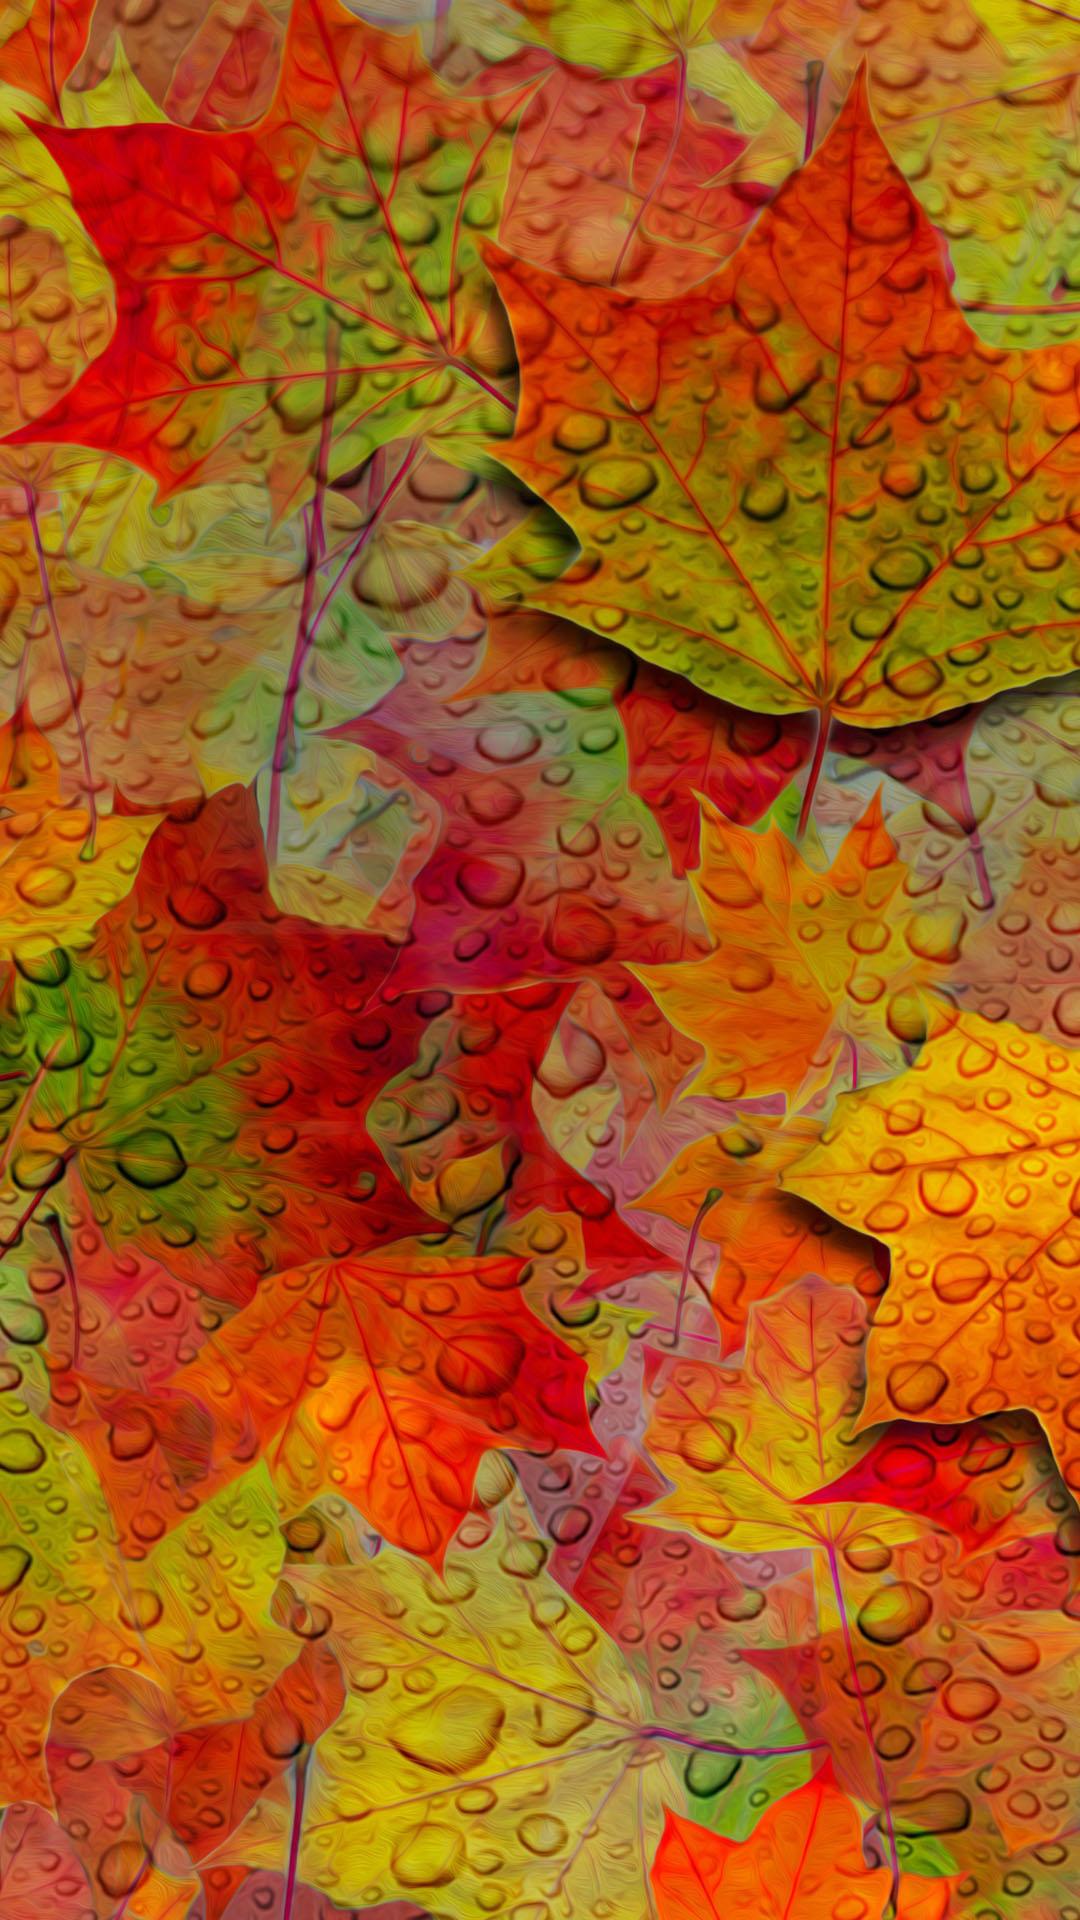 Fall Leaves Iphone 6 Plus Wallpaper Fall Iphone Wallpapers Pixelstalk Net